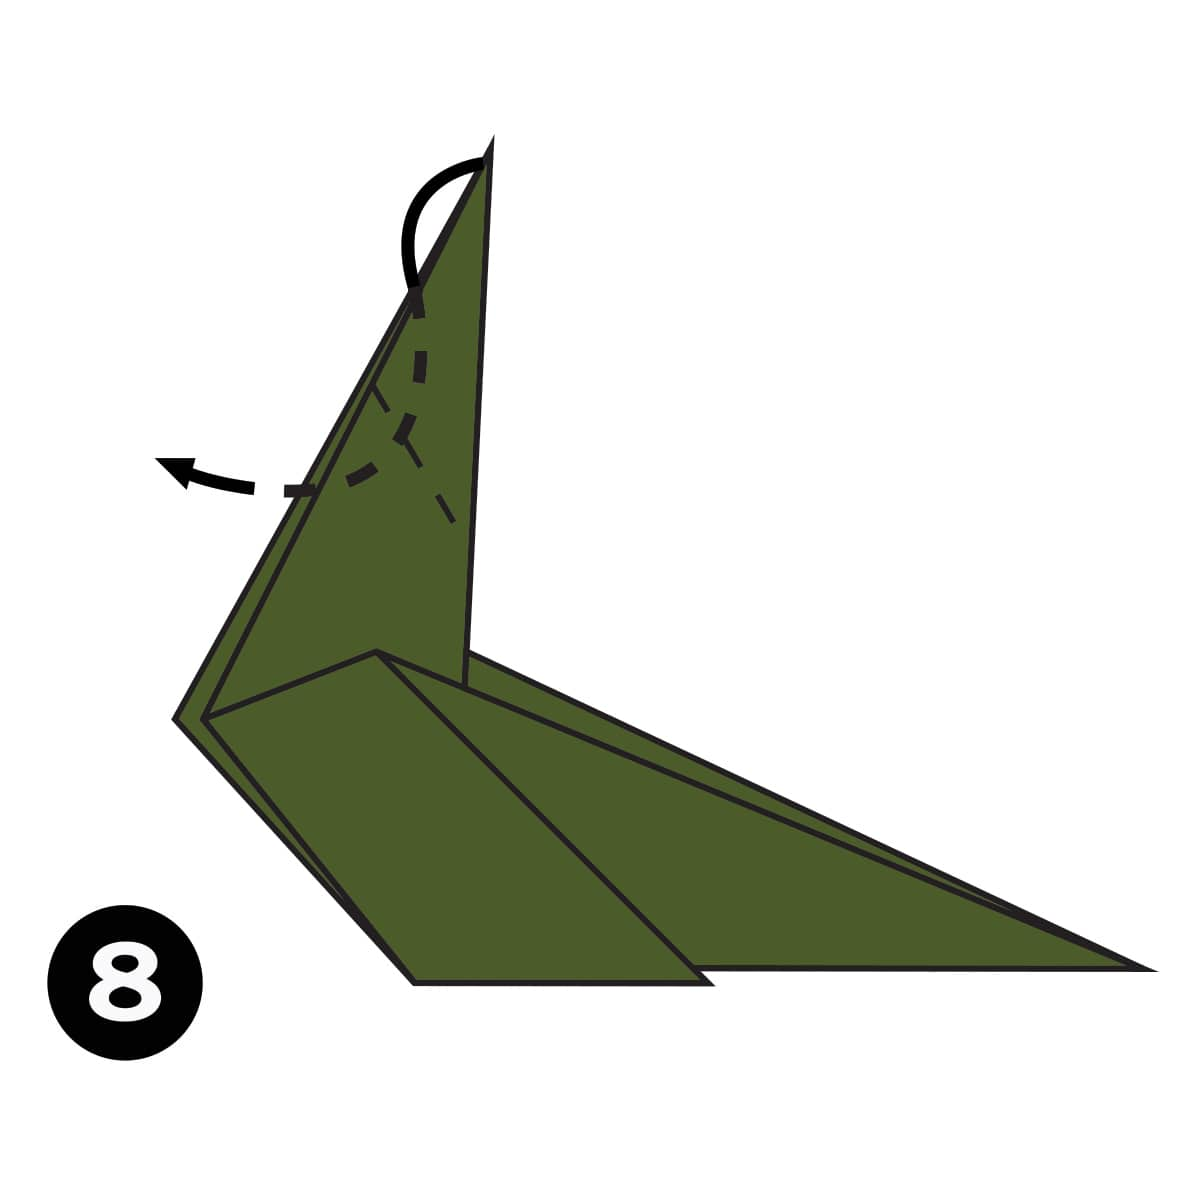 Seal Step 8